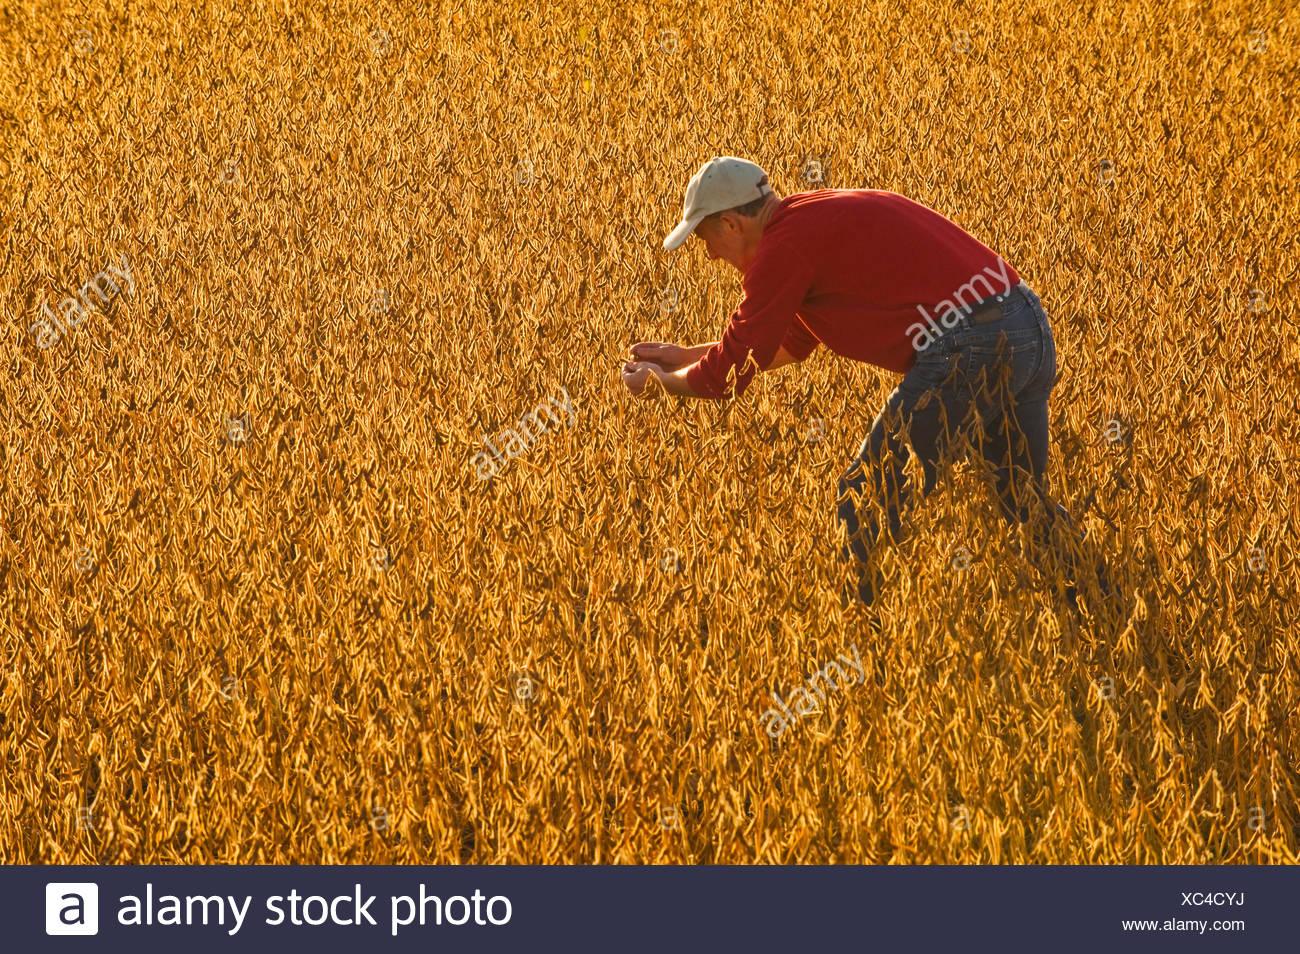 a farmer checks the maturity of soybean pods in a field , near Lorette, Manitoba, Canada - Stock Image